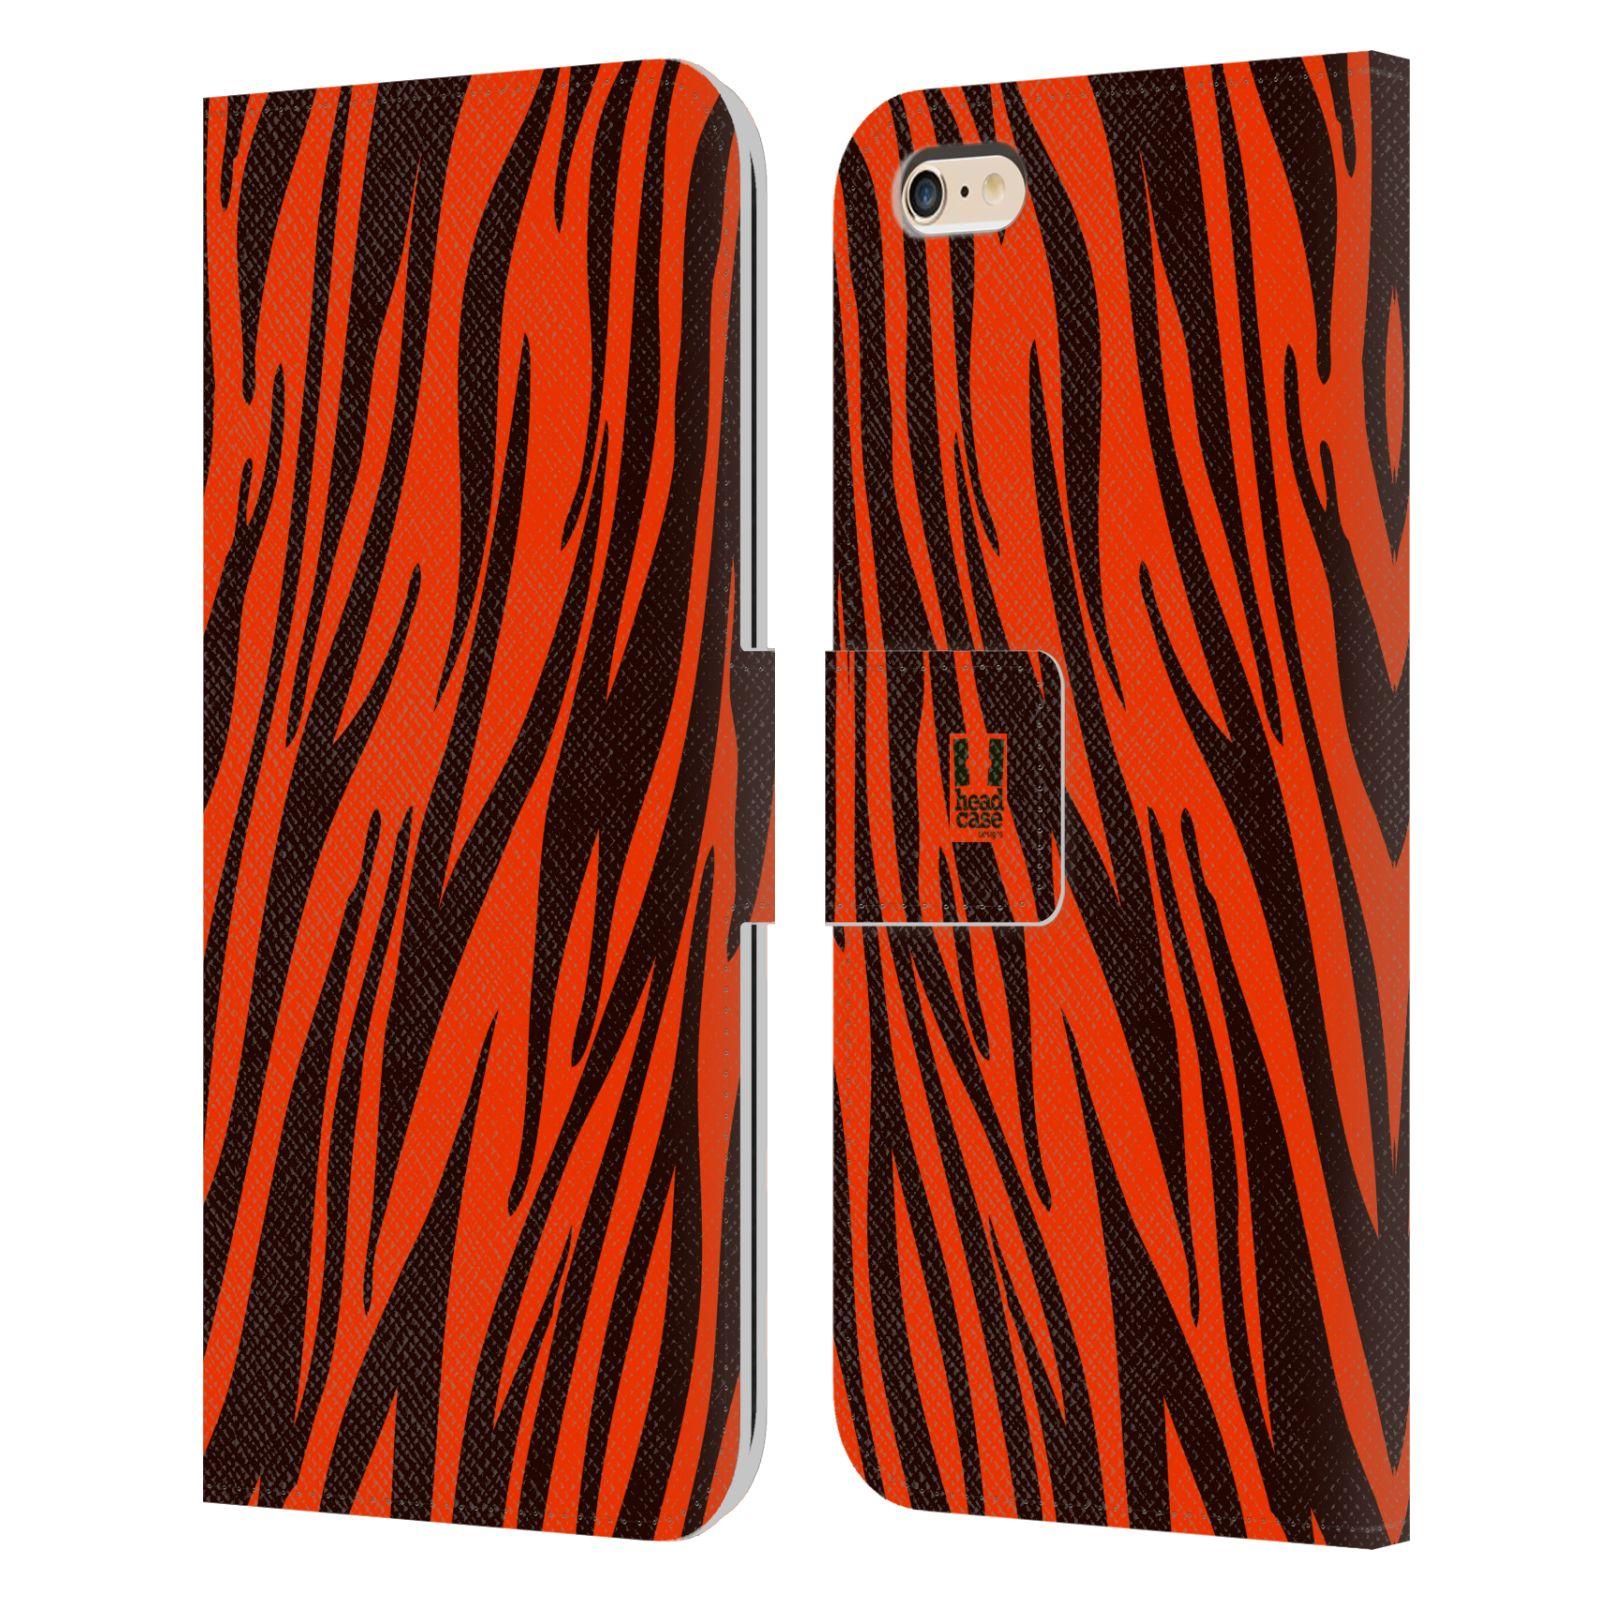 HEAD CASE Flipové pouzdro pro mobil Apple Iphone 6 PLUS / 6S PLUS Zvířecí barevné vzory oranžový tygr